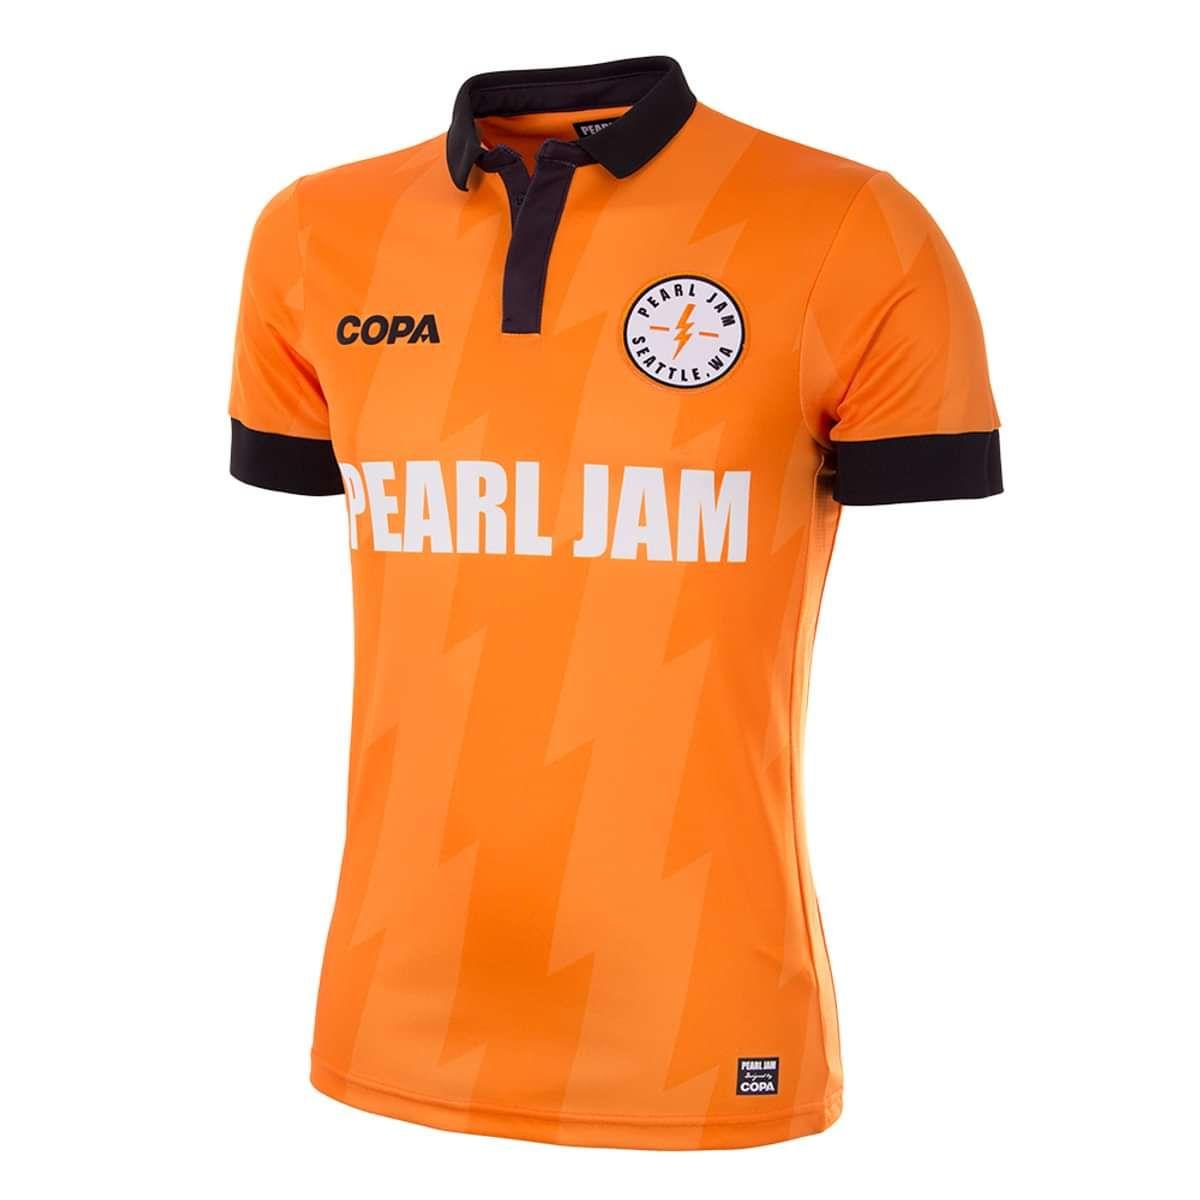 Netherlands – Soccer Shirt - Pearl Jam